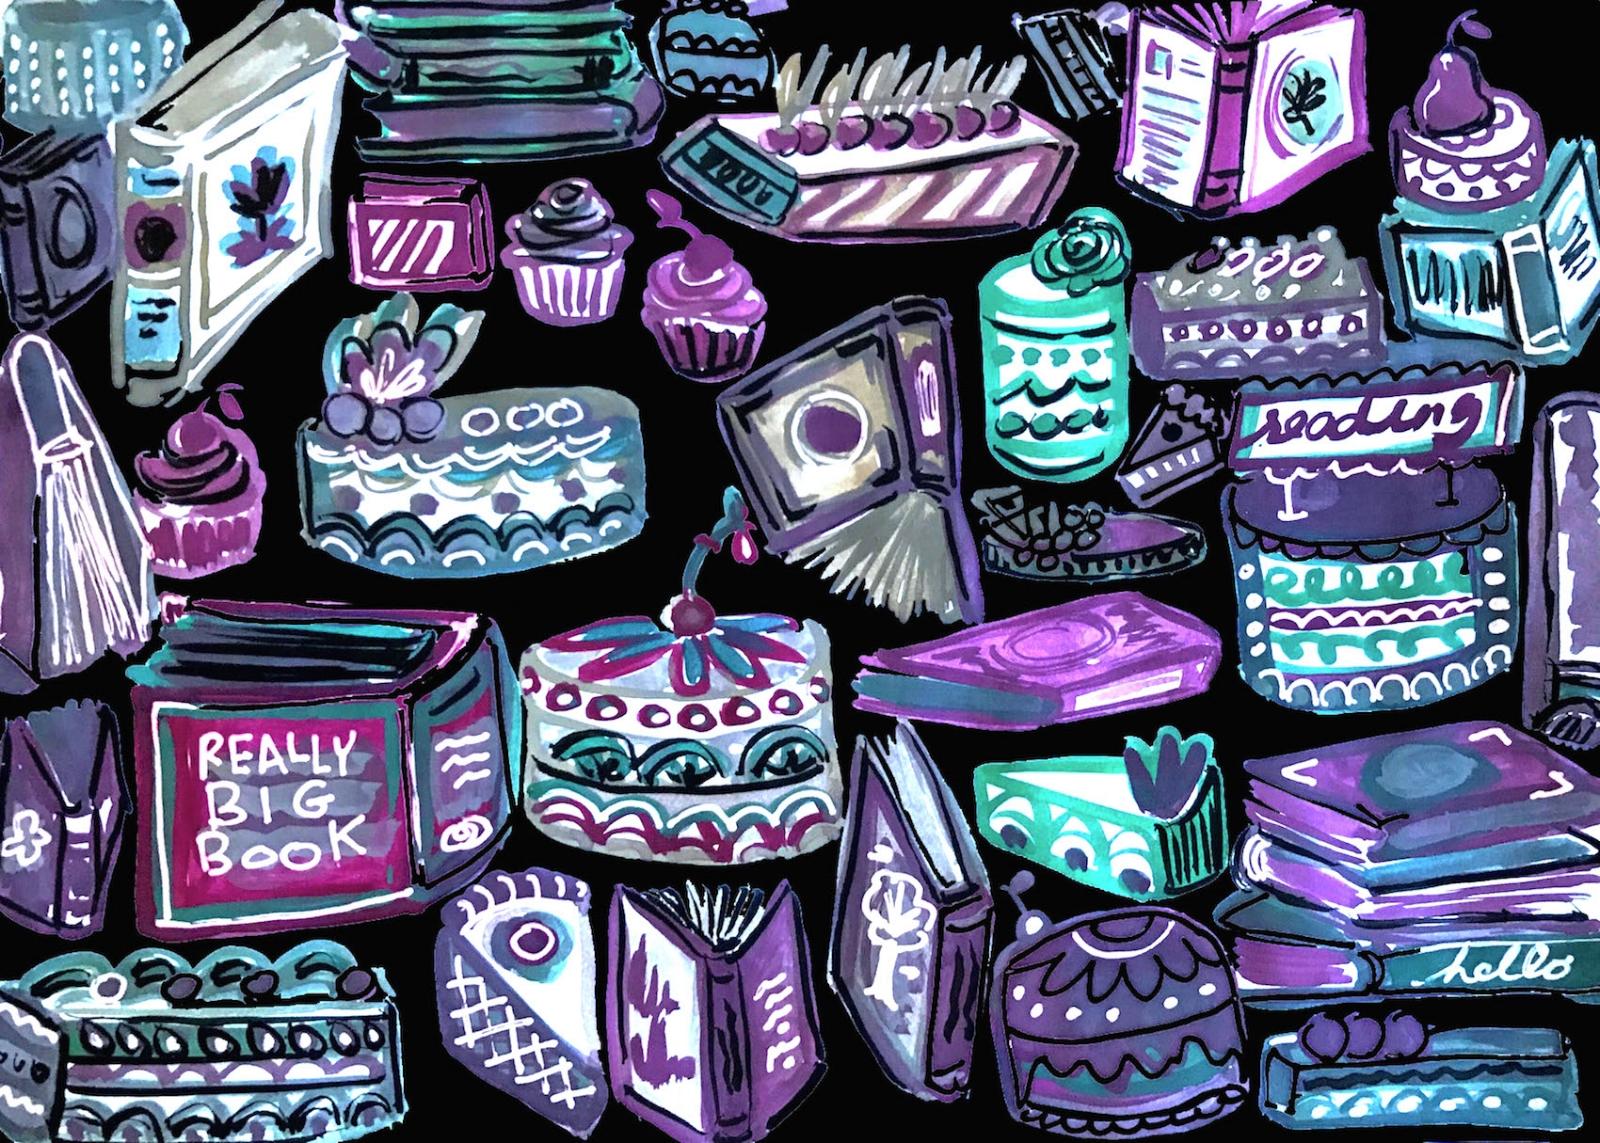 purplegreen_booksandcakes_filled.jpg